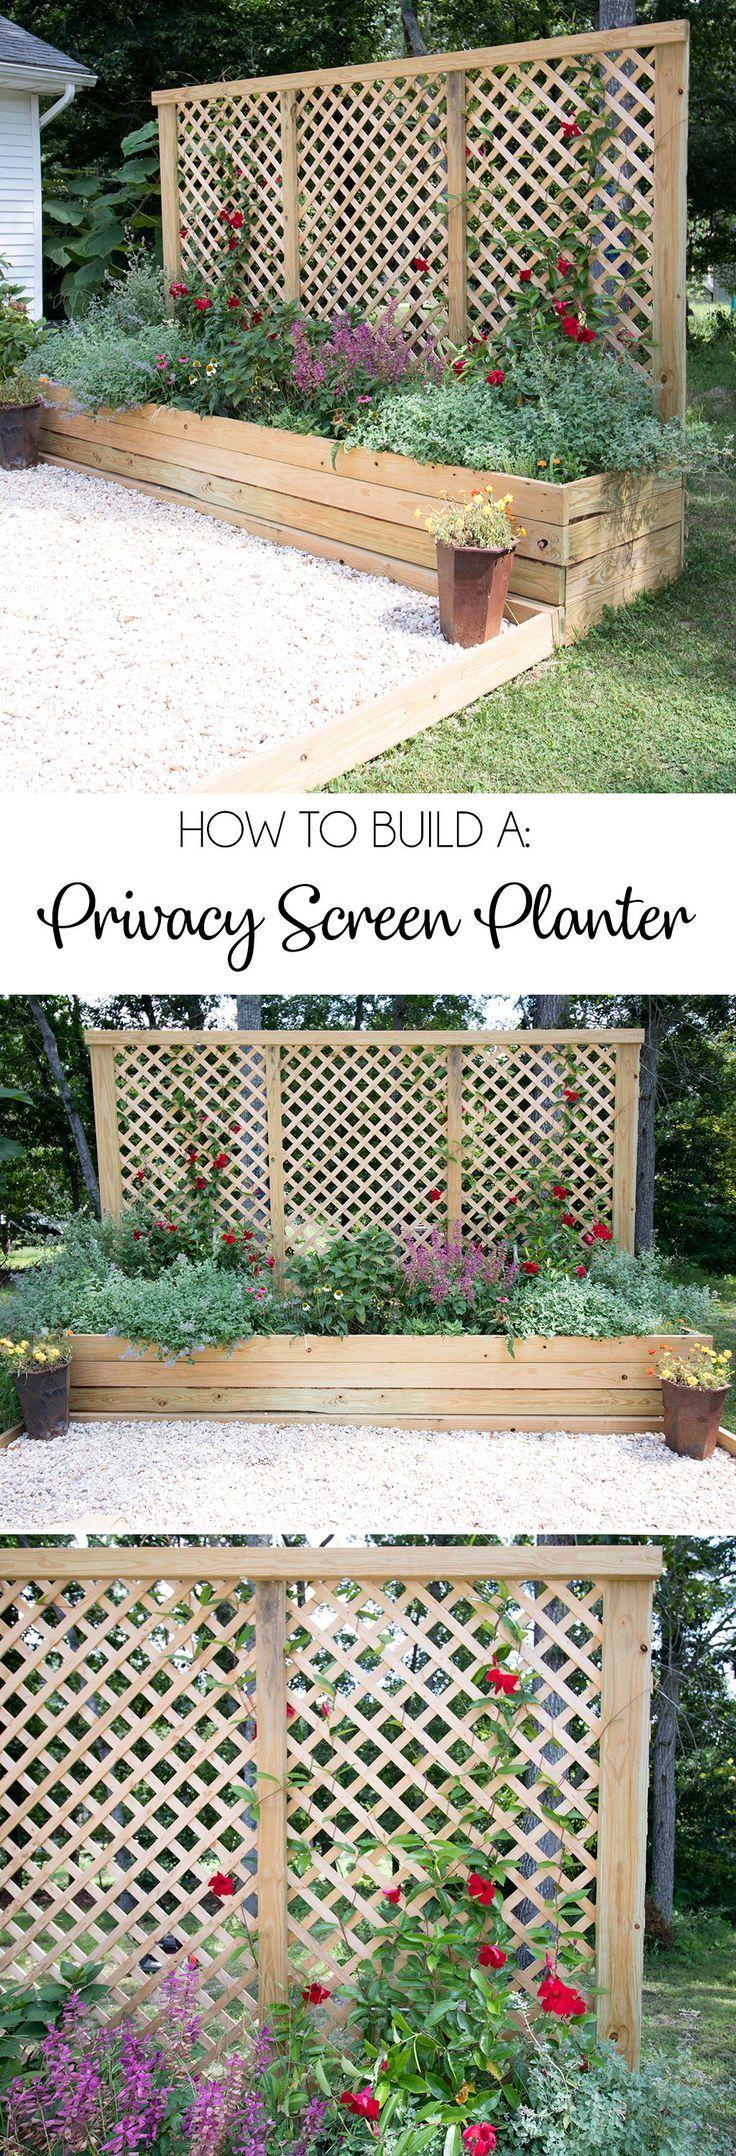 Privateness Display screen Planter DIY